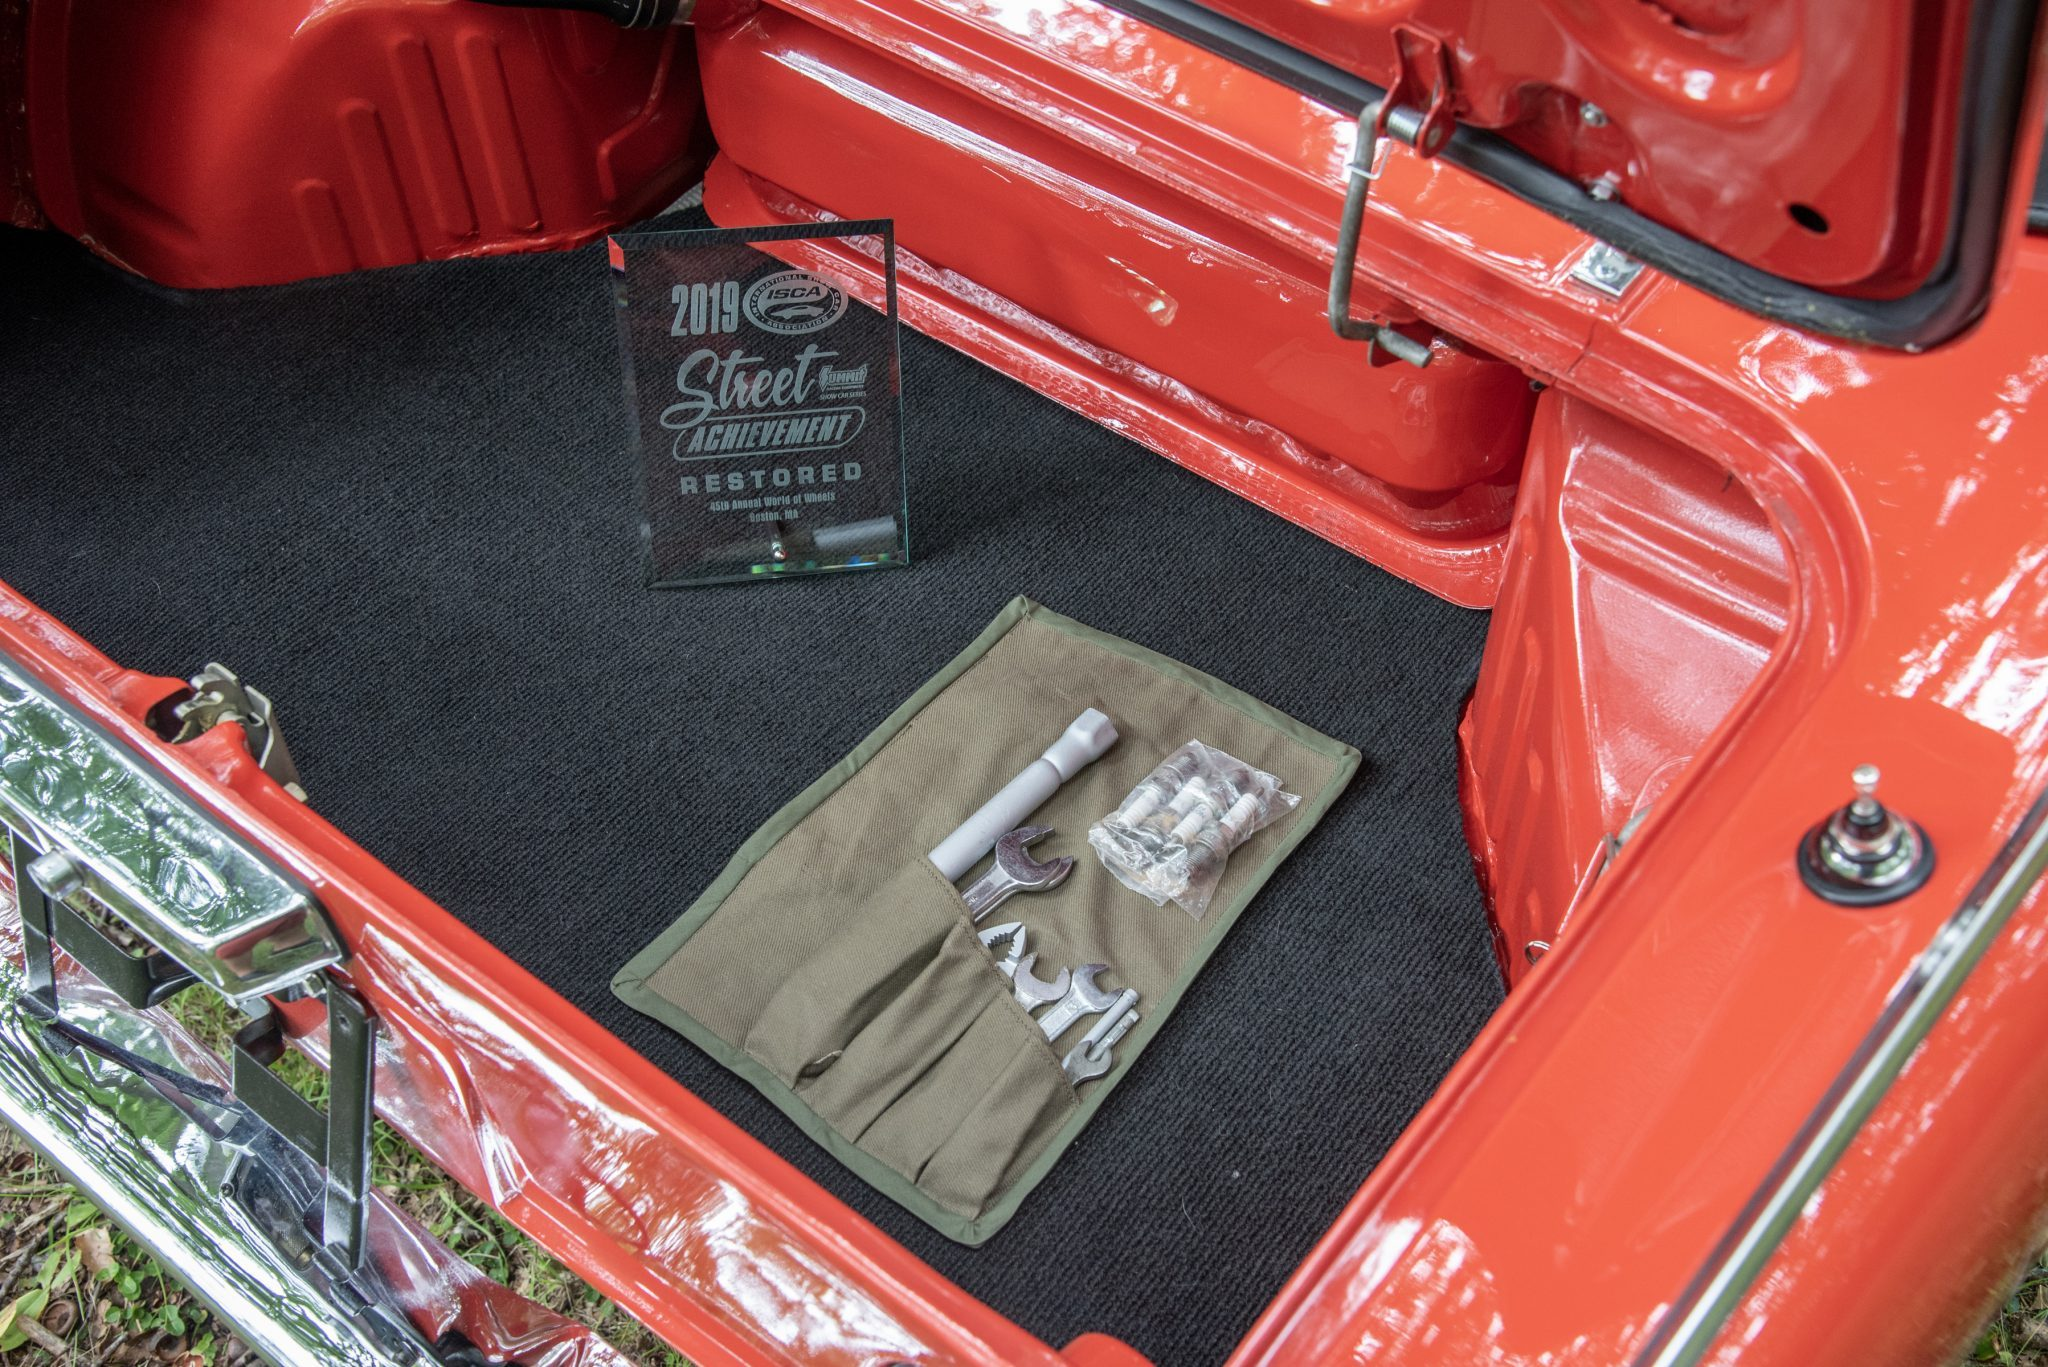 Honda S600 trunk interior toolkit